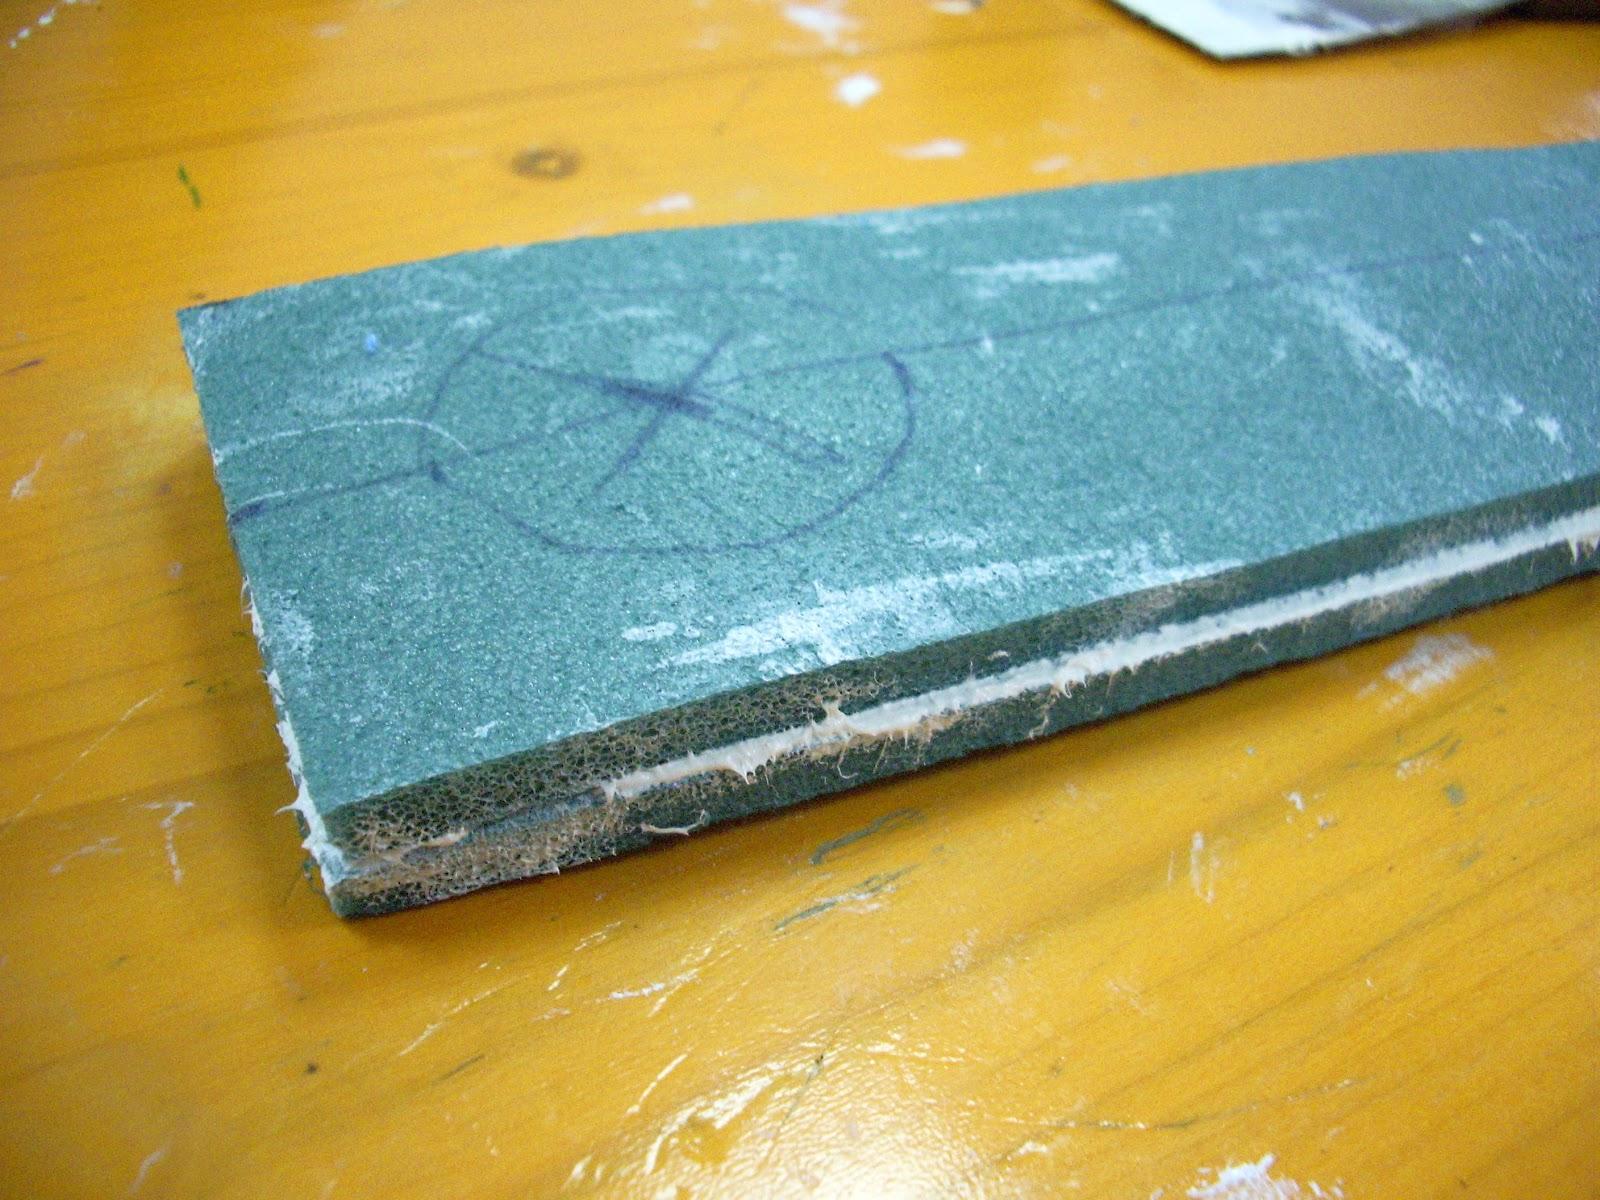 Las forjas de skilfngheim c mo fabricar espadas de for Varillas de fibra de vidrio leroy merlin